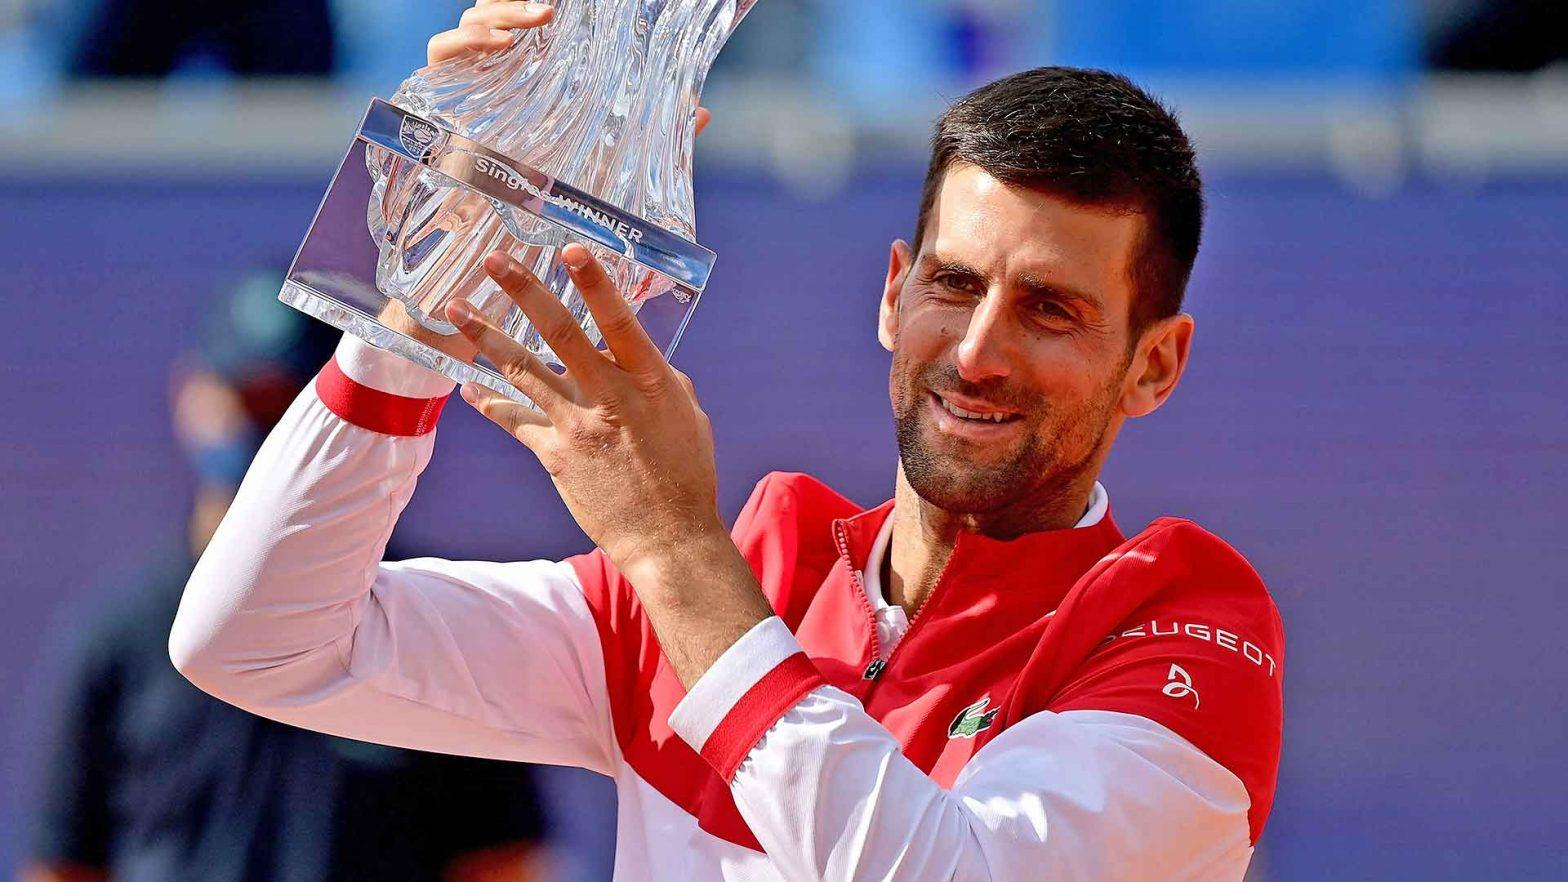 Djokovic Wins 83rd Career Title In Belgrade open | জোকোভিচ বেলগ্রেড ওপেন জিতে নিজের ক্যারিয়ার এর 83 তম শিরোপা জয় করলেন_40.1